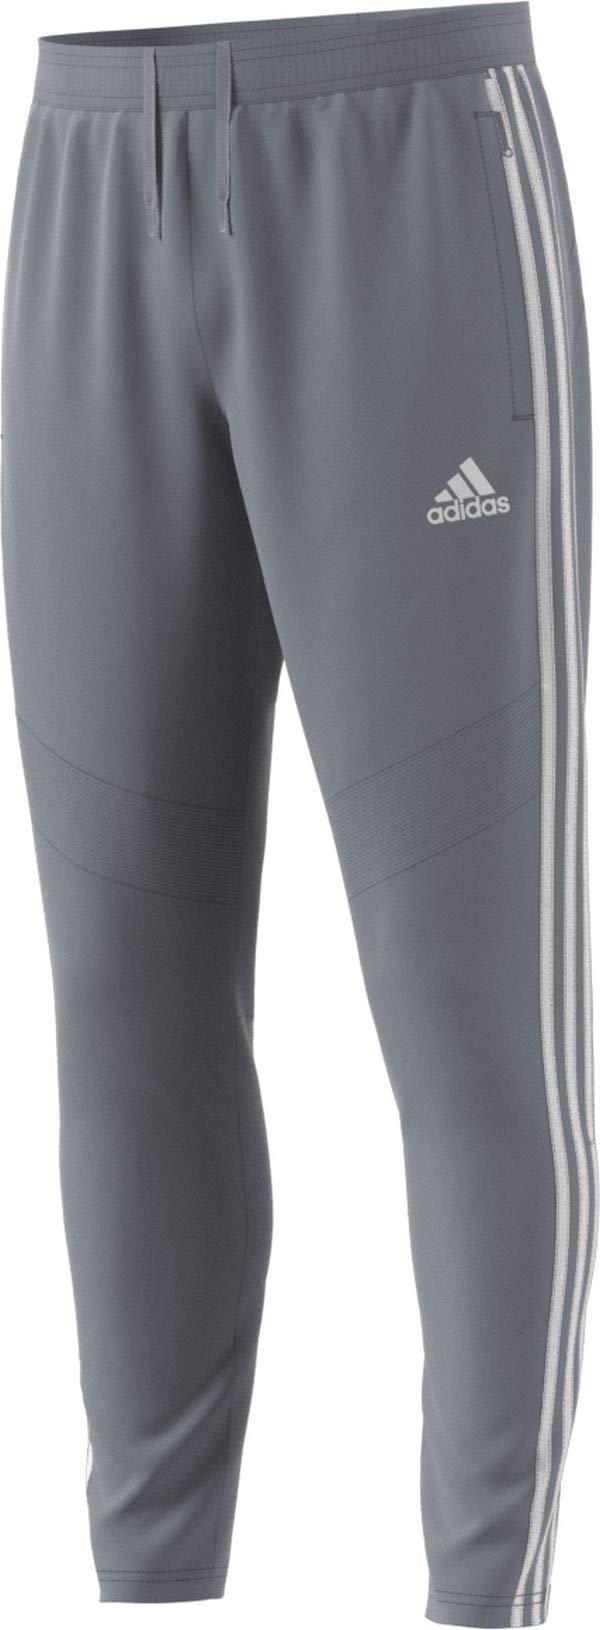 adidas Tiro 19 Training Pant - Men's Soccer M/L